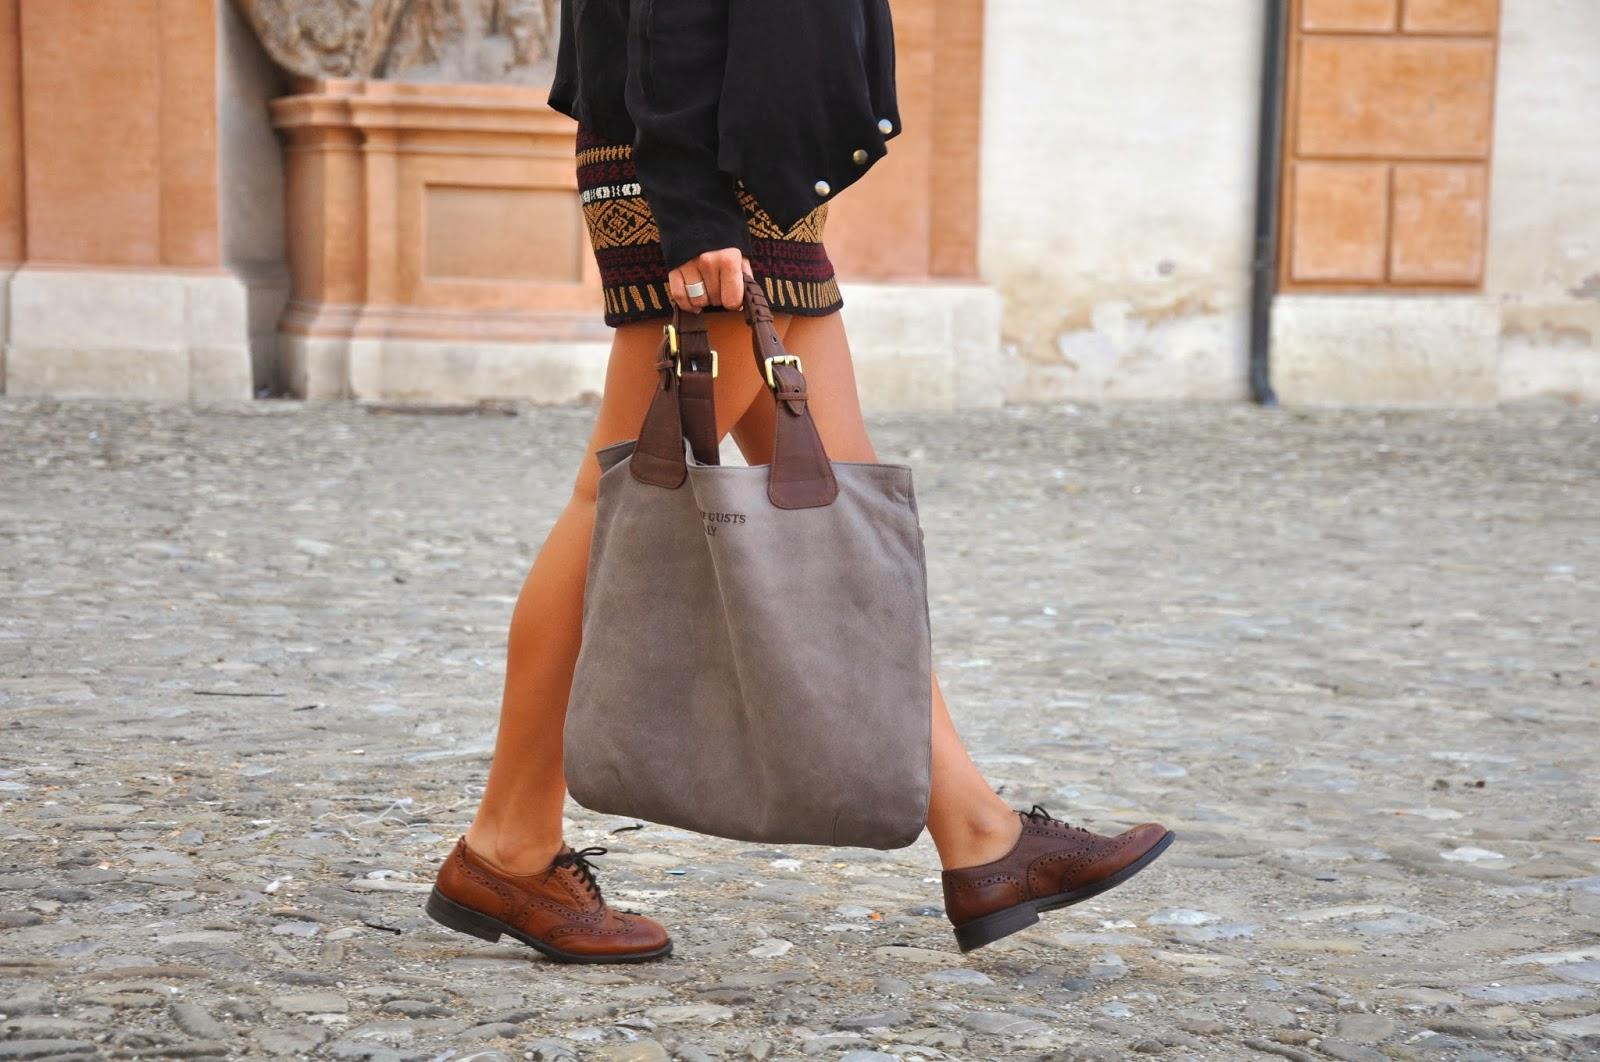 Skirt and laced shoes - ToBeMe di Giulia Malavasi